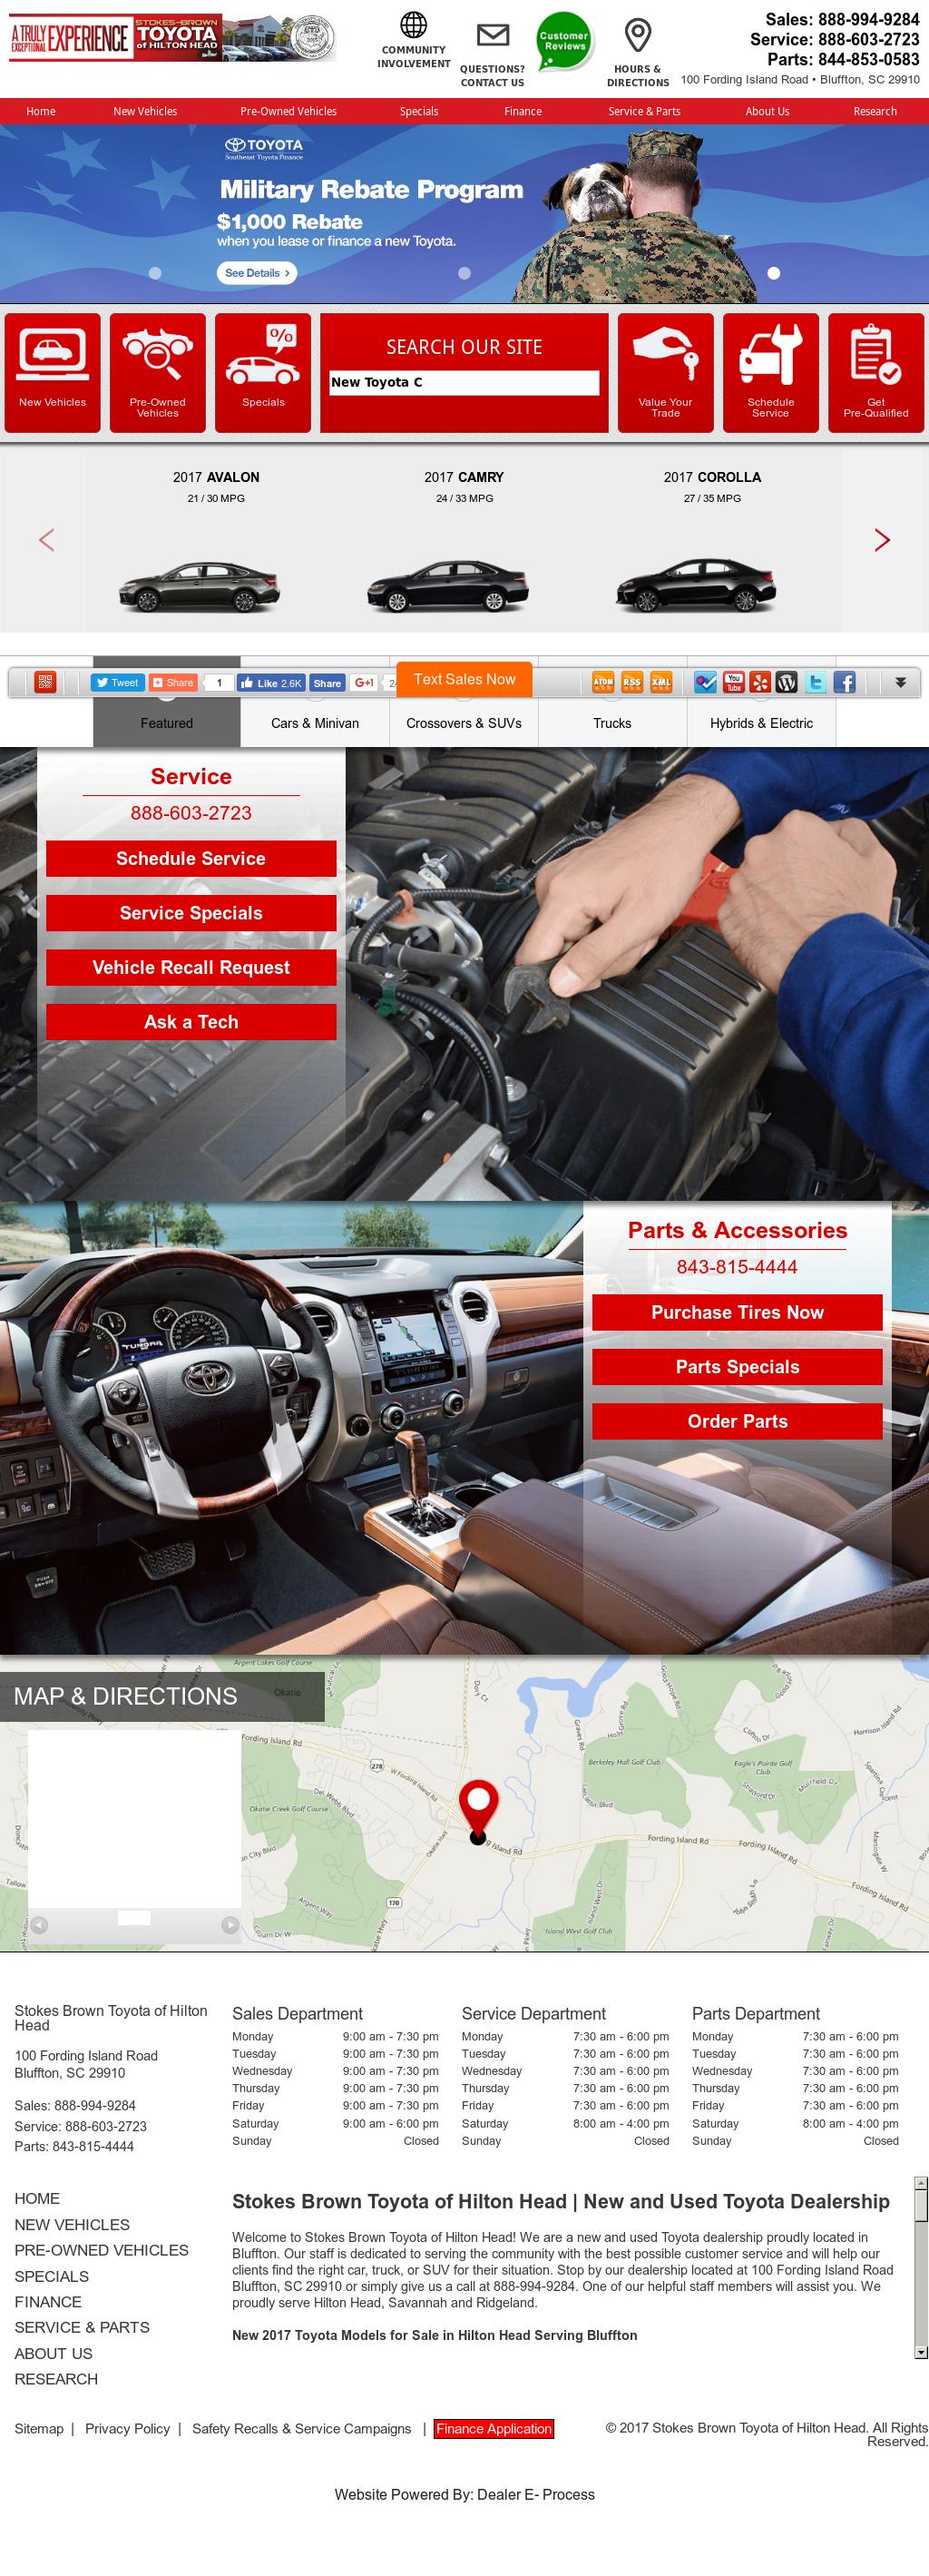 Stokes Brown Toyota Of Hilton Head Petitors Revenue And